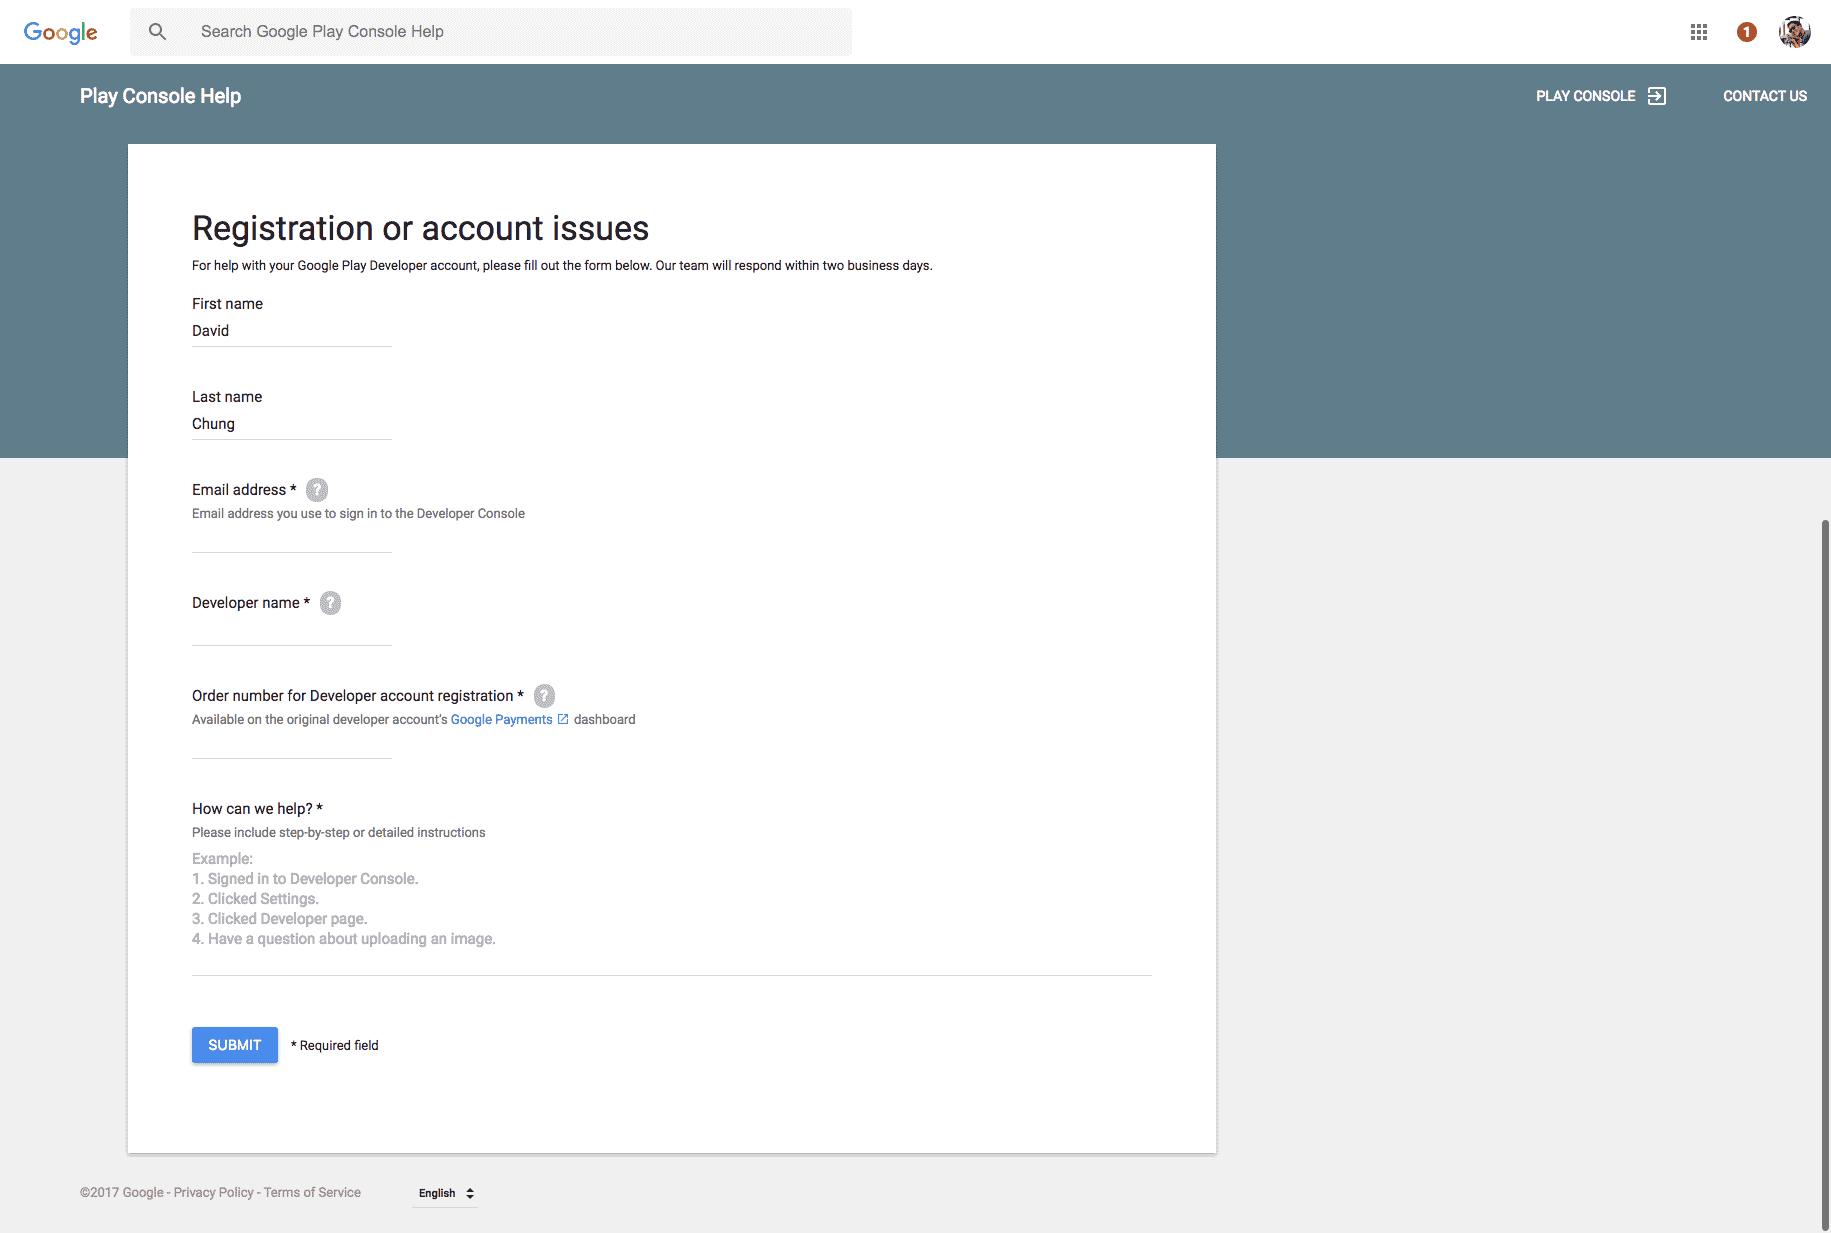 googles play developer cons - HD1831×1233